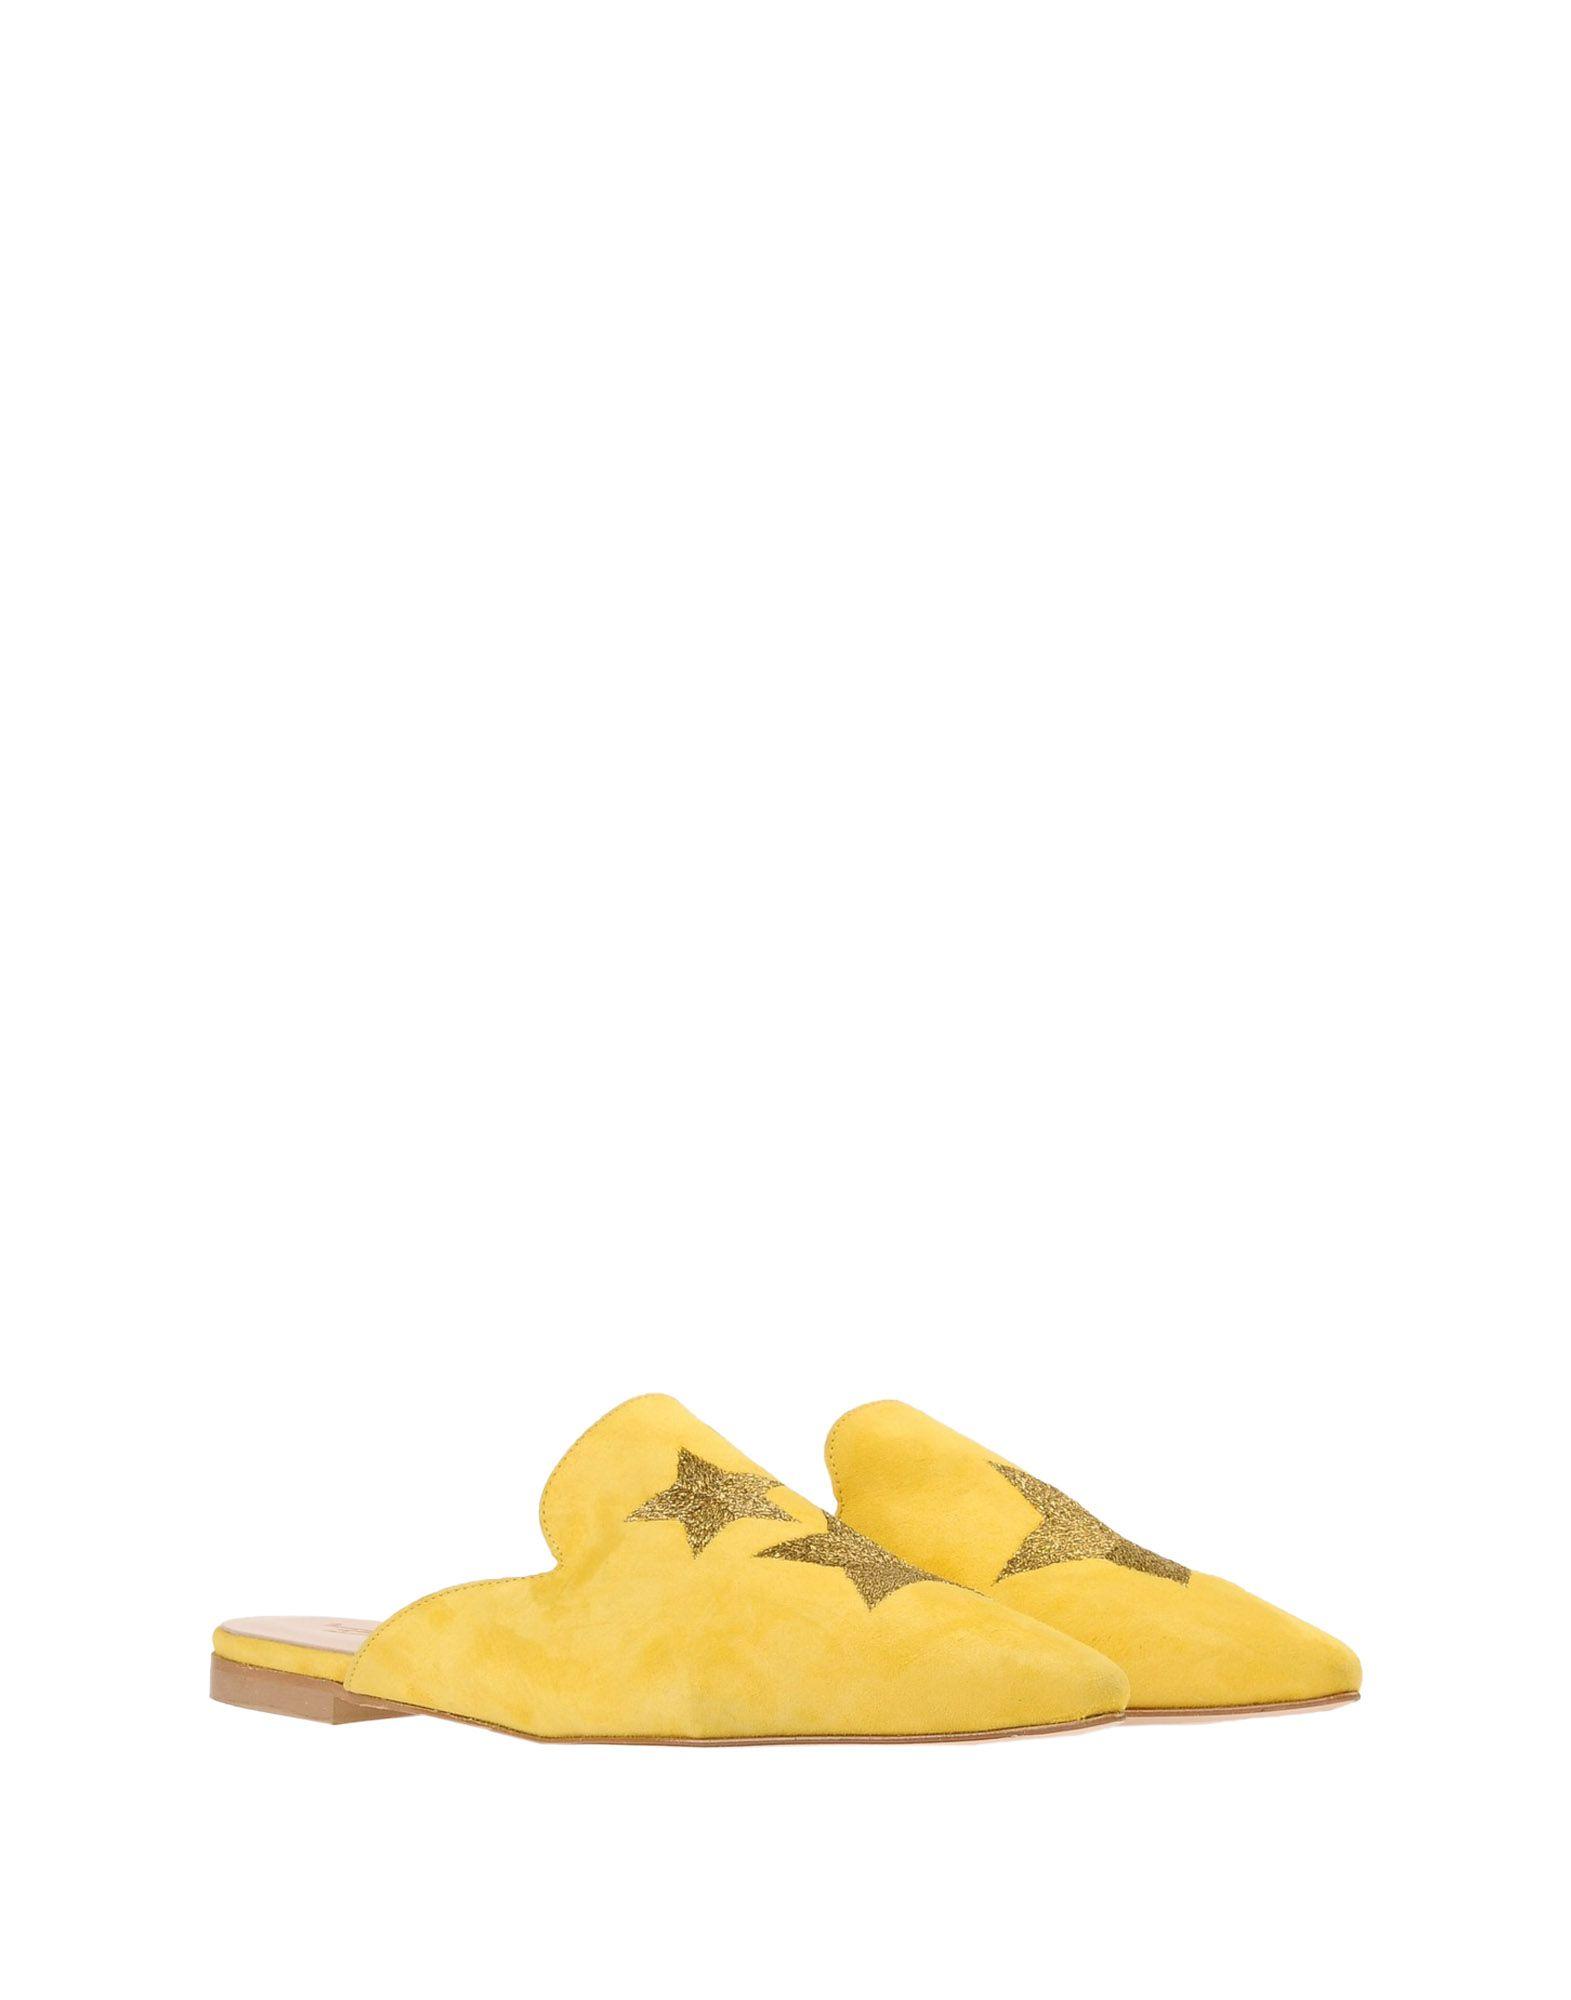 Bianca Di Gute Pantoletten Damen  11440845HH Gute Di Qualität beliebte Schuhe 737a31